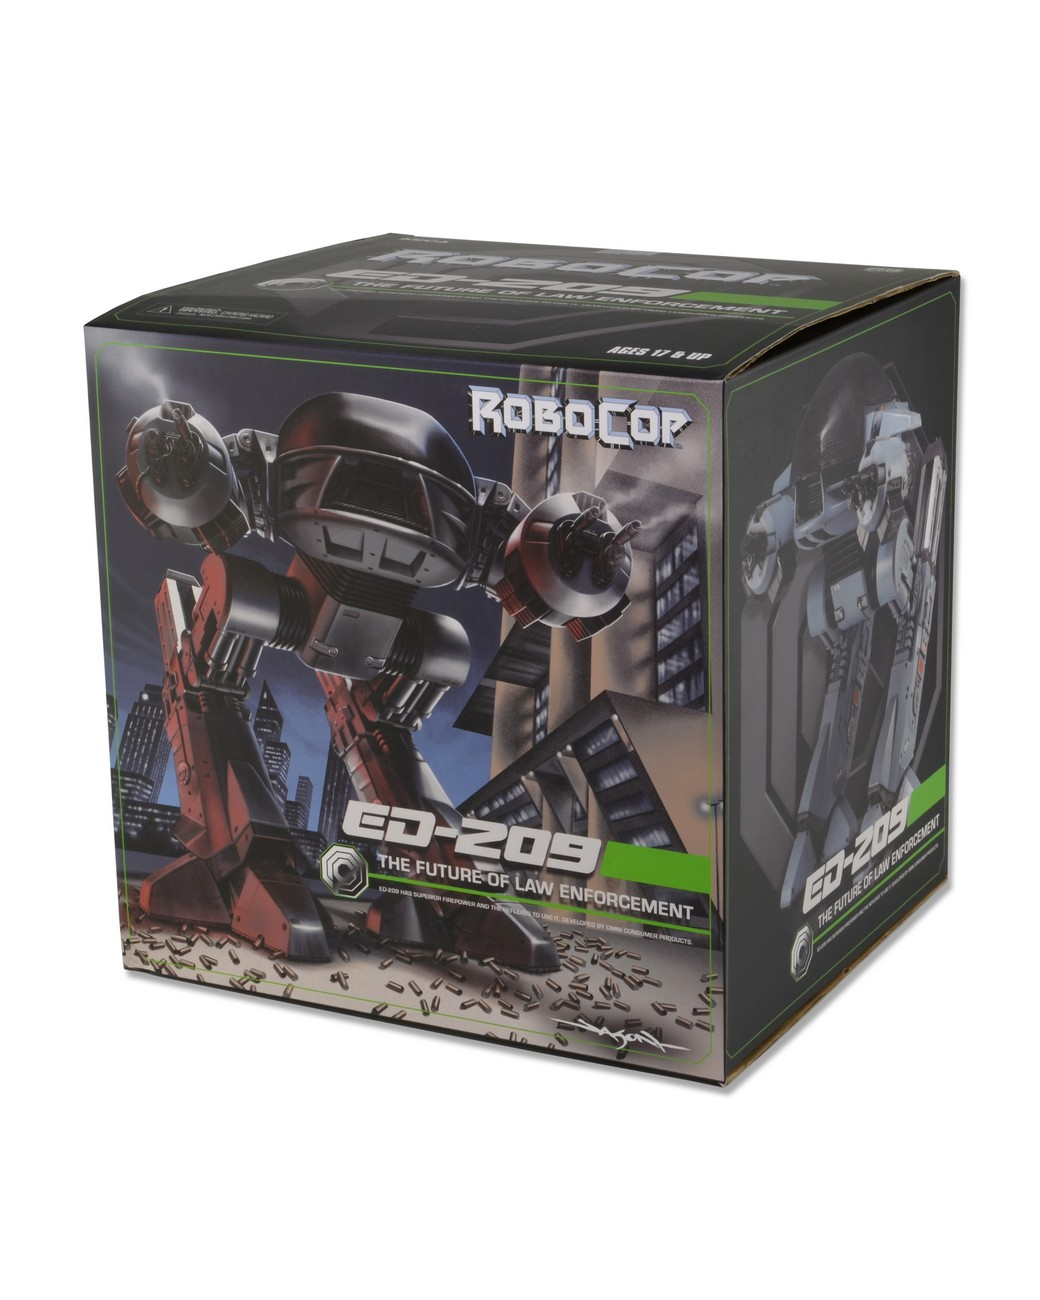 [NECA] RoboCop - ED-209 NECA-Robocop-1987-ED-209-009